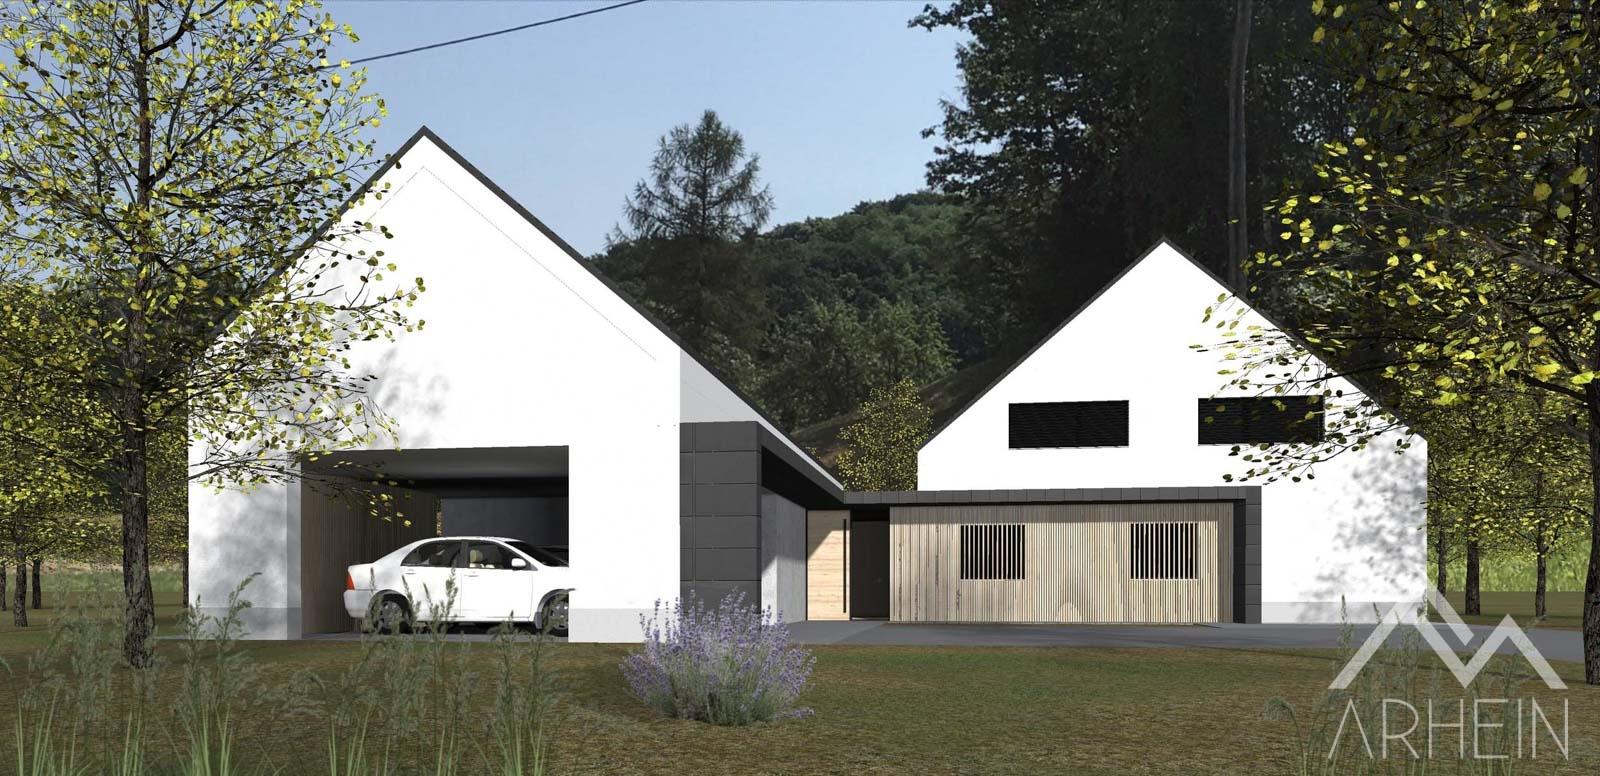 arhein-arhitektura-projekti-hisa-s-3